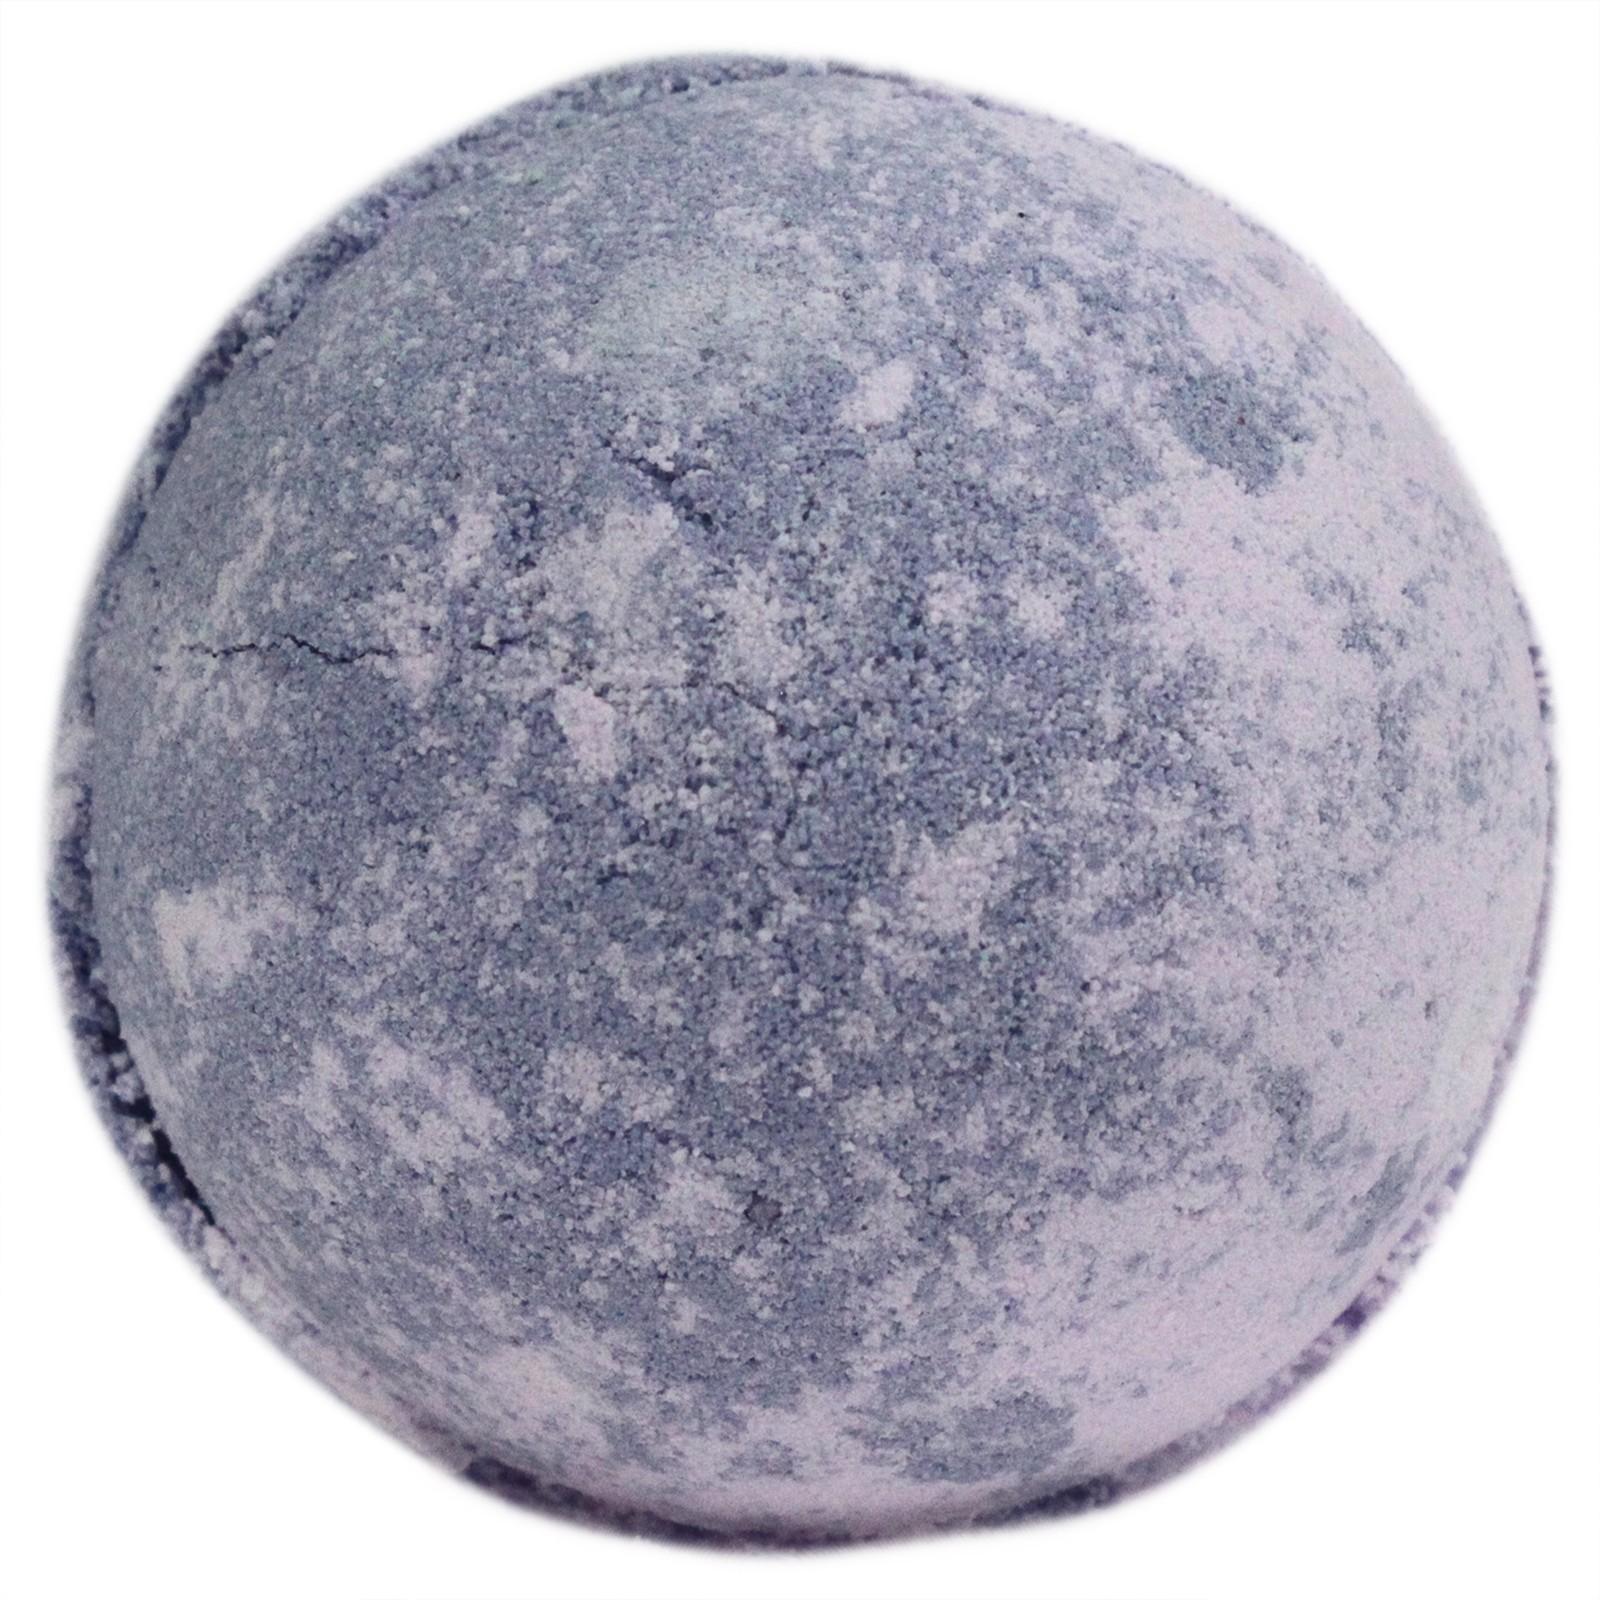 Yorkshire (Parma) Violet Bath Bomb